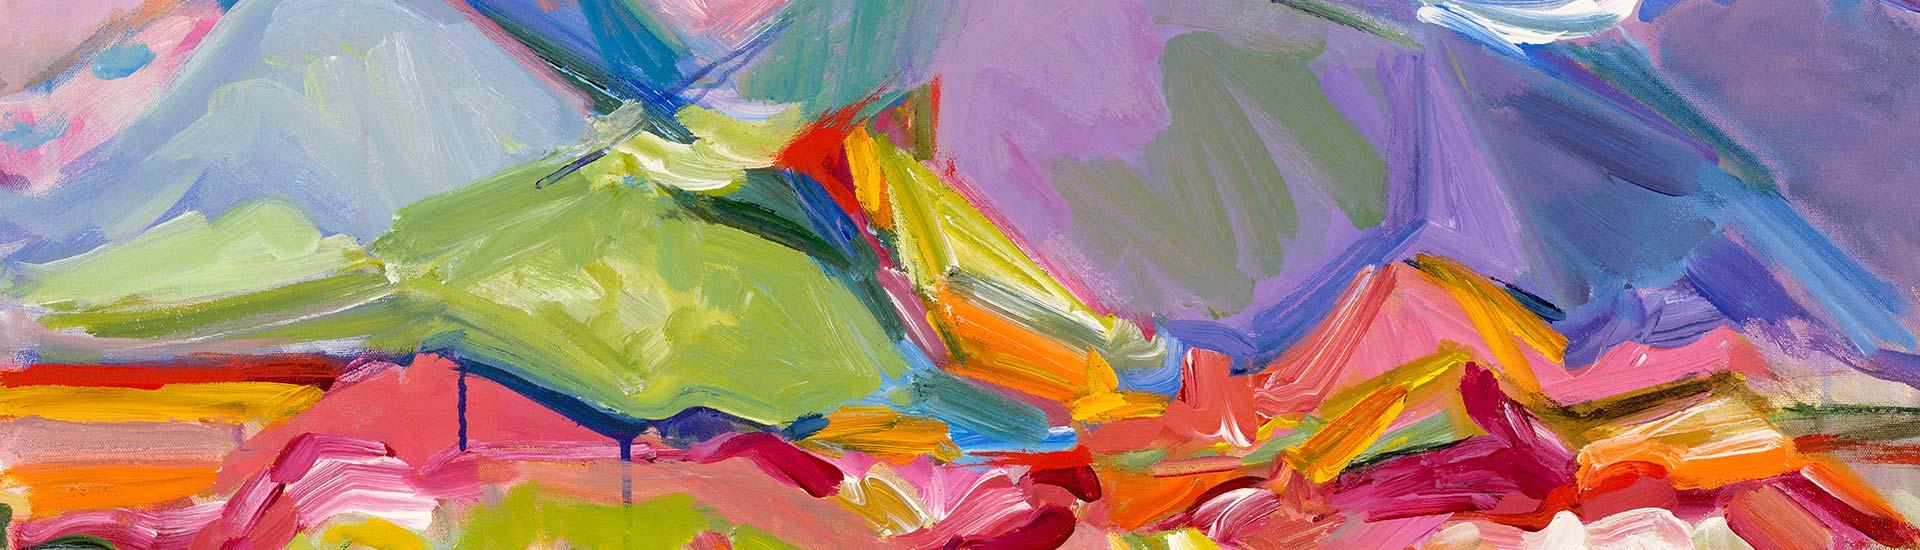 Colors of the Landscape